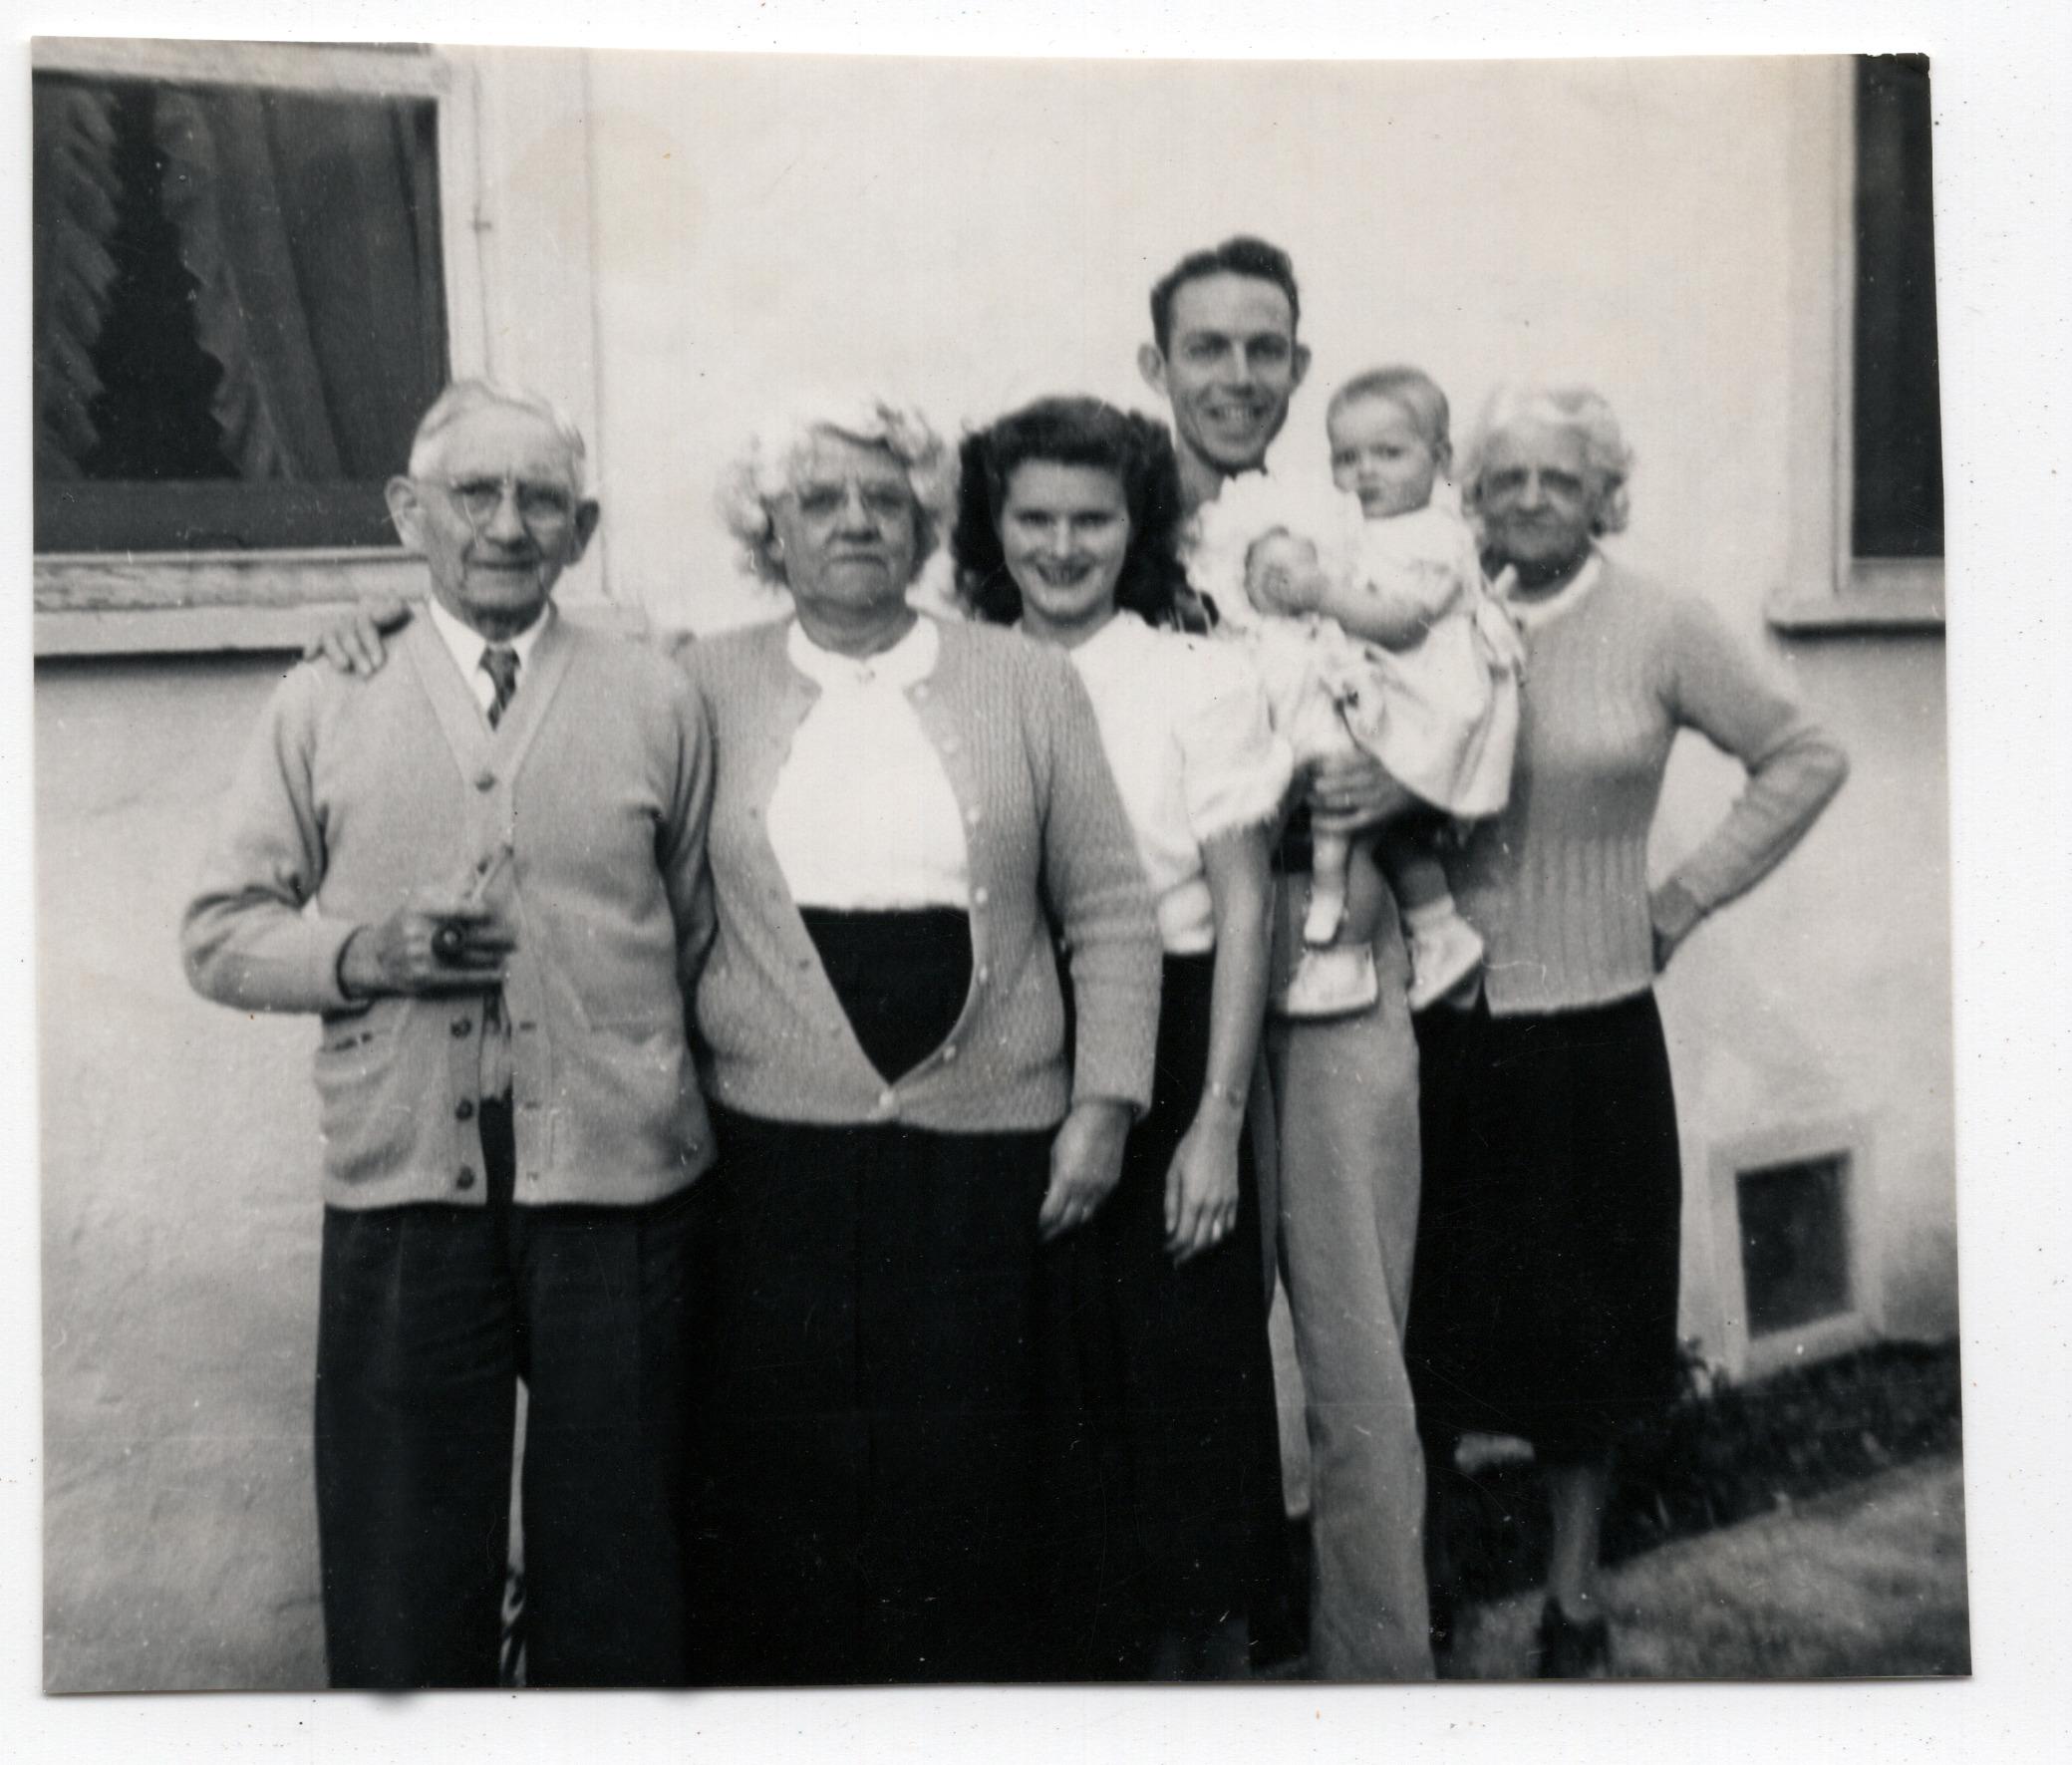 Henry, Jane, Melba, Bob, Susan & Annie